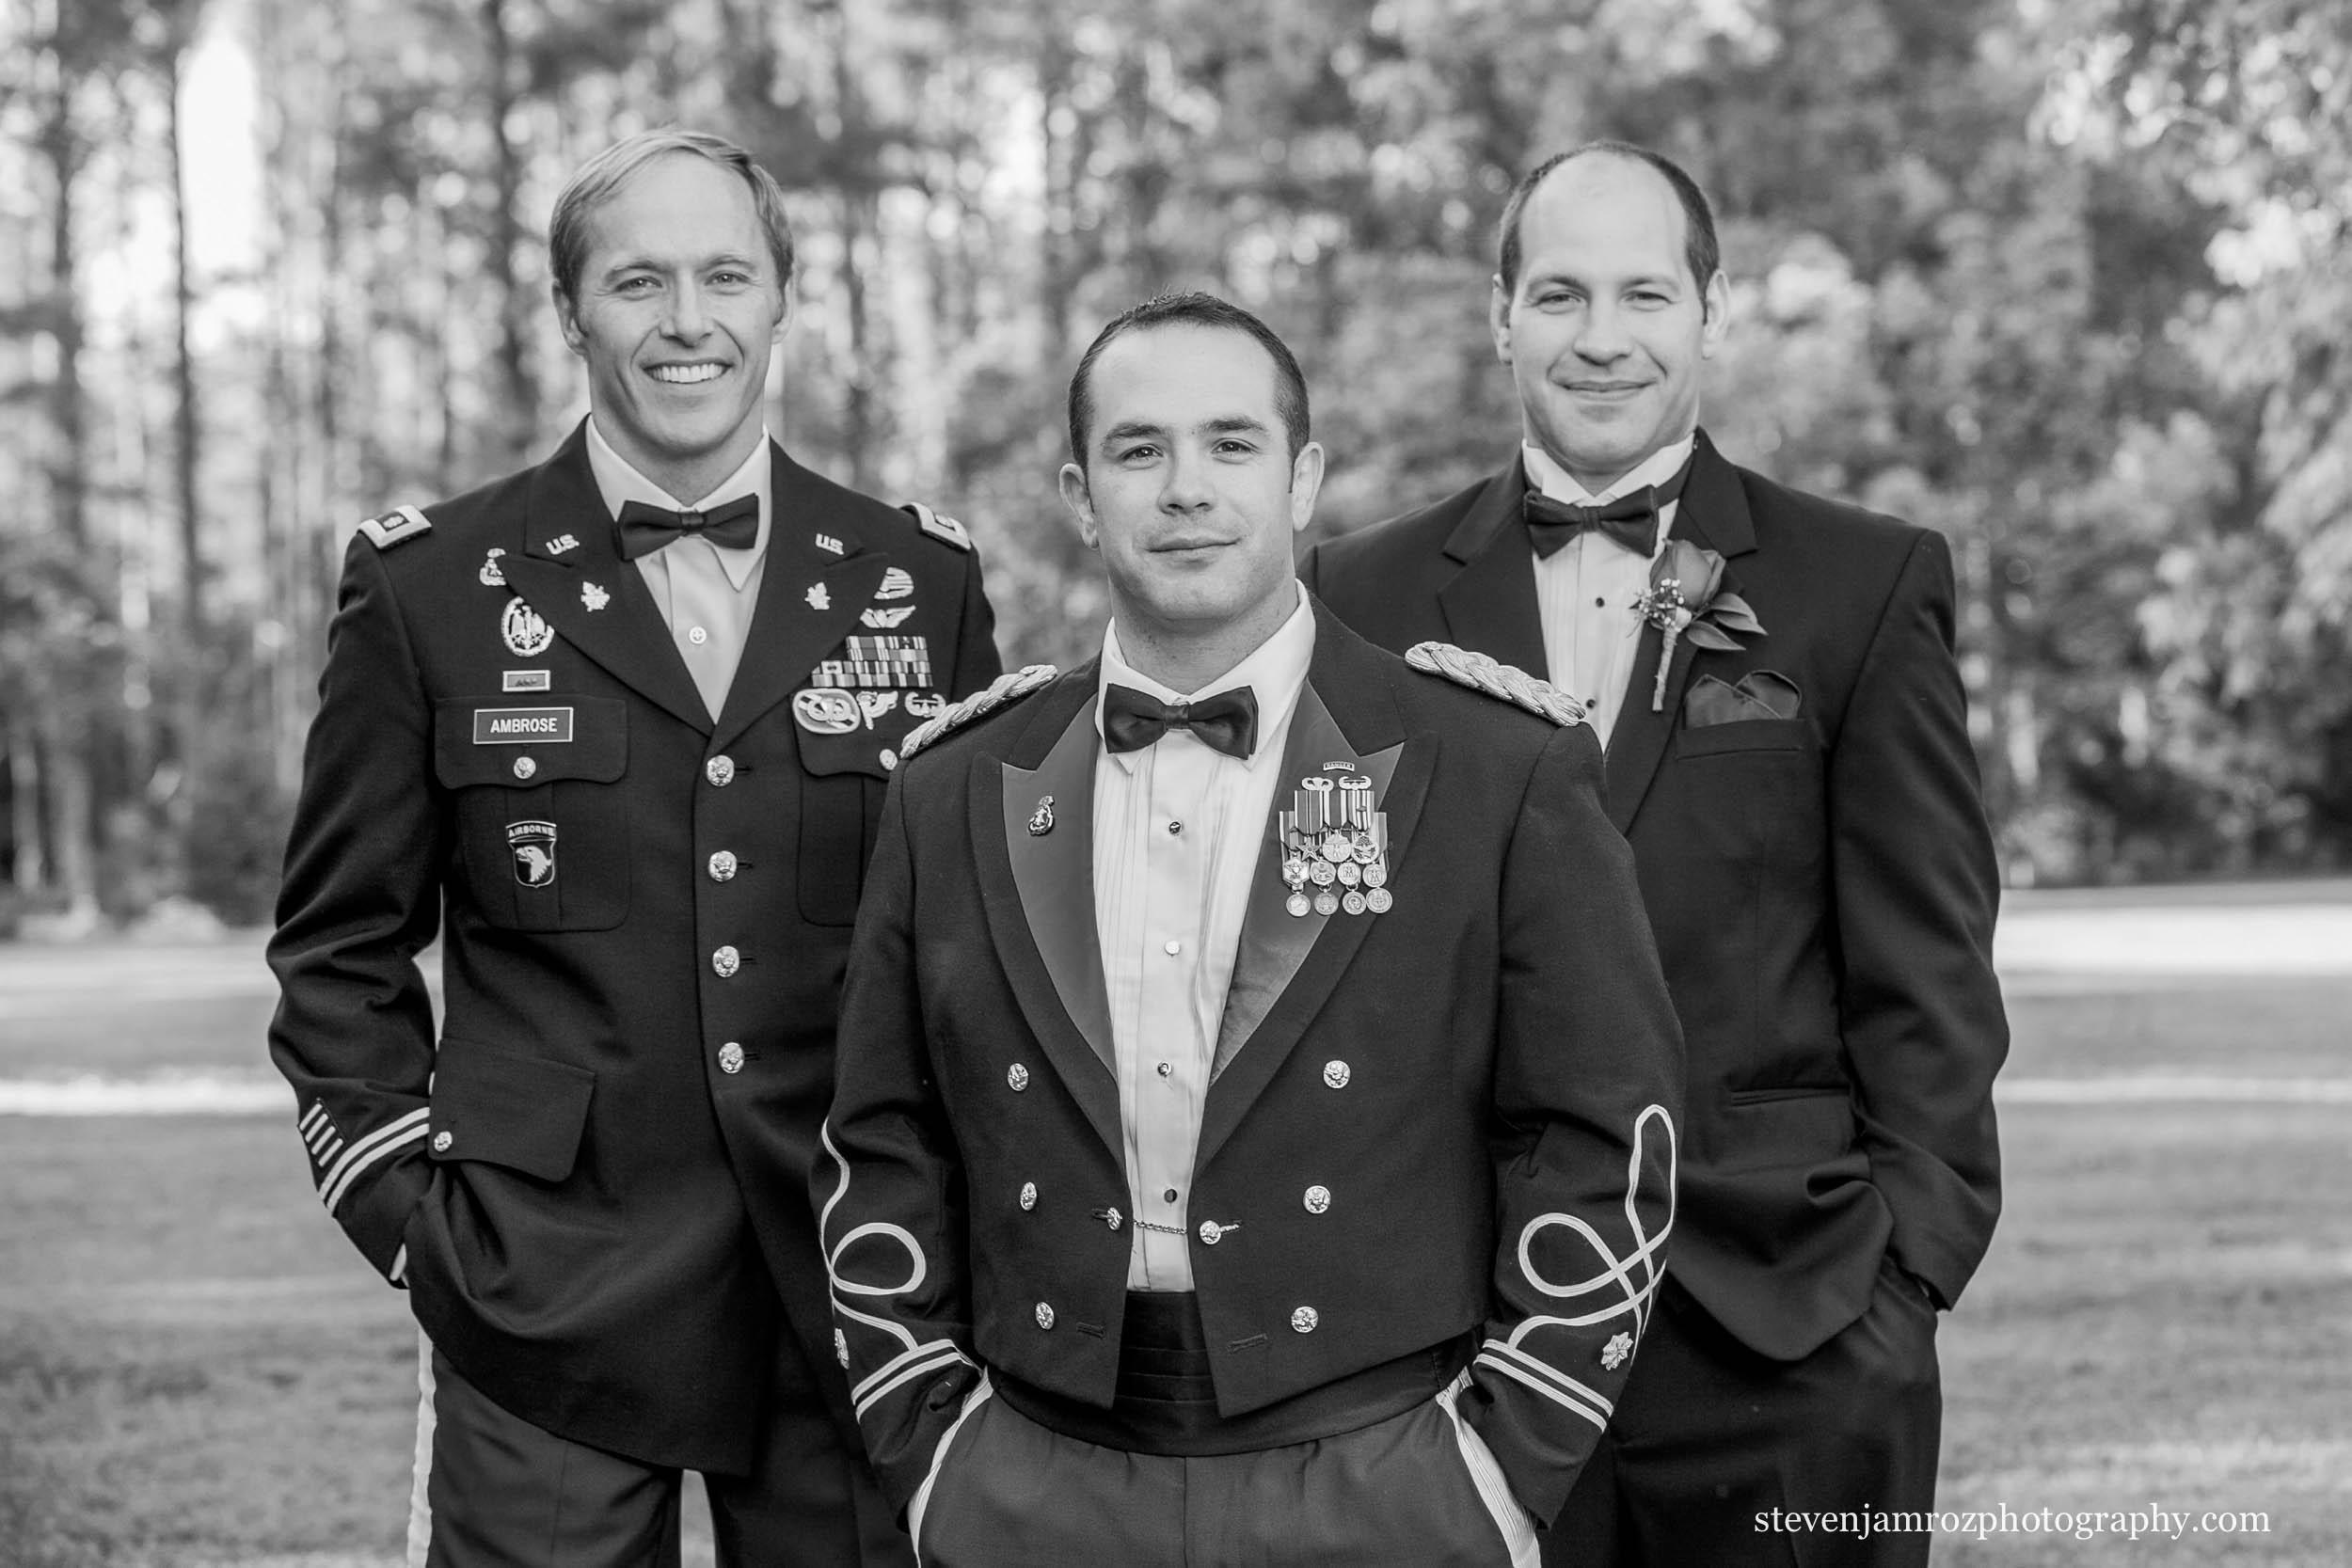 military-wedding-raleigh-steven-jamroz-photography-0315.jpg